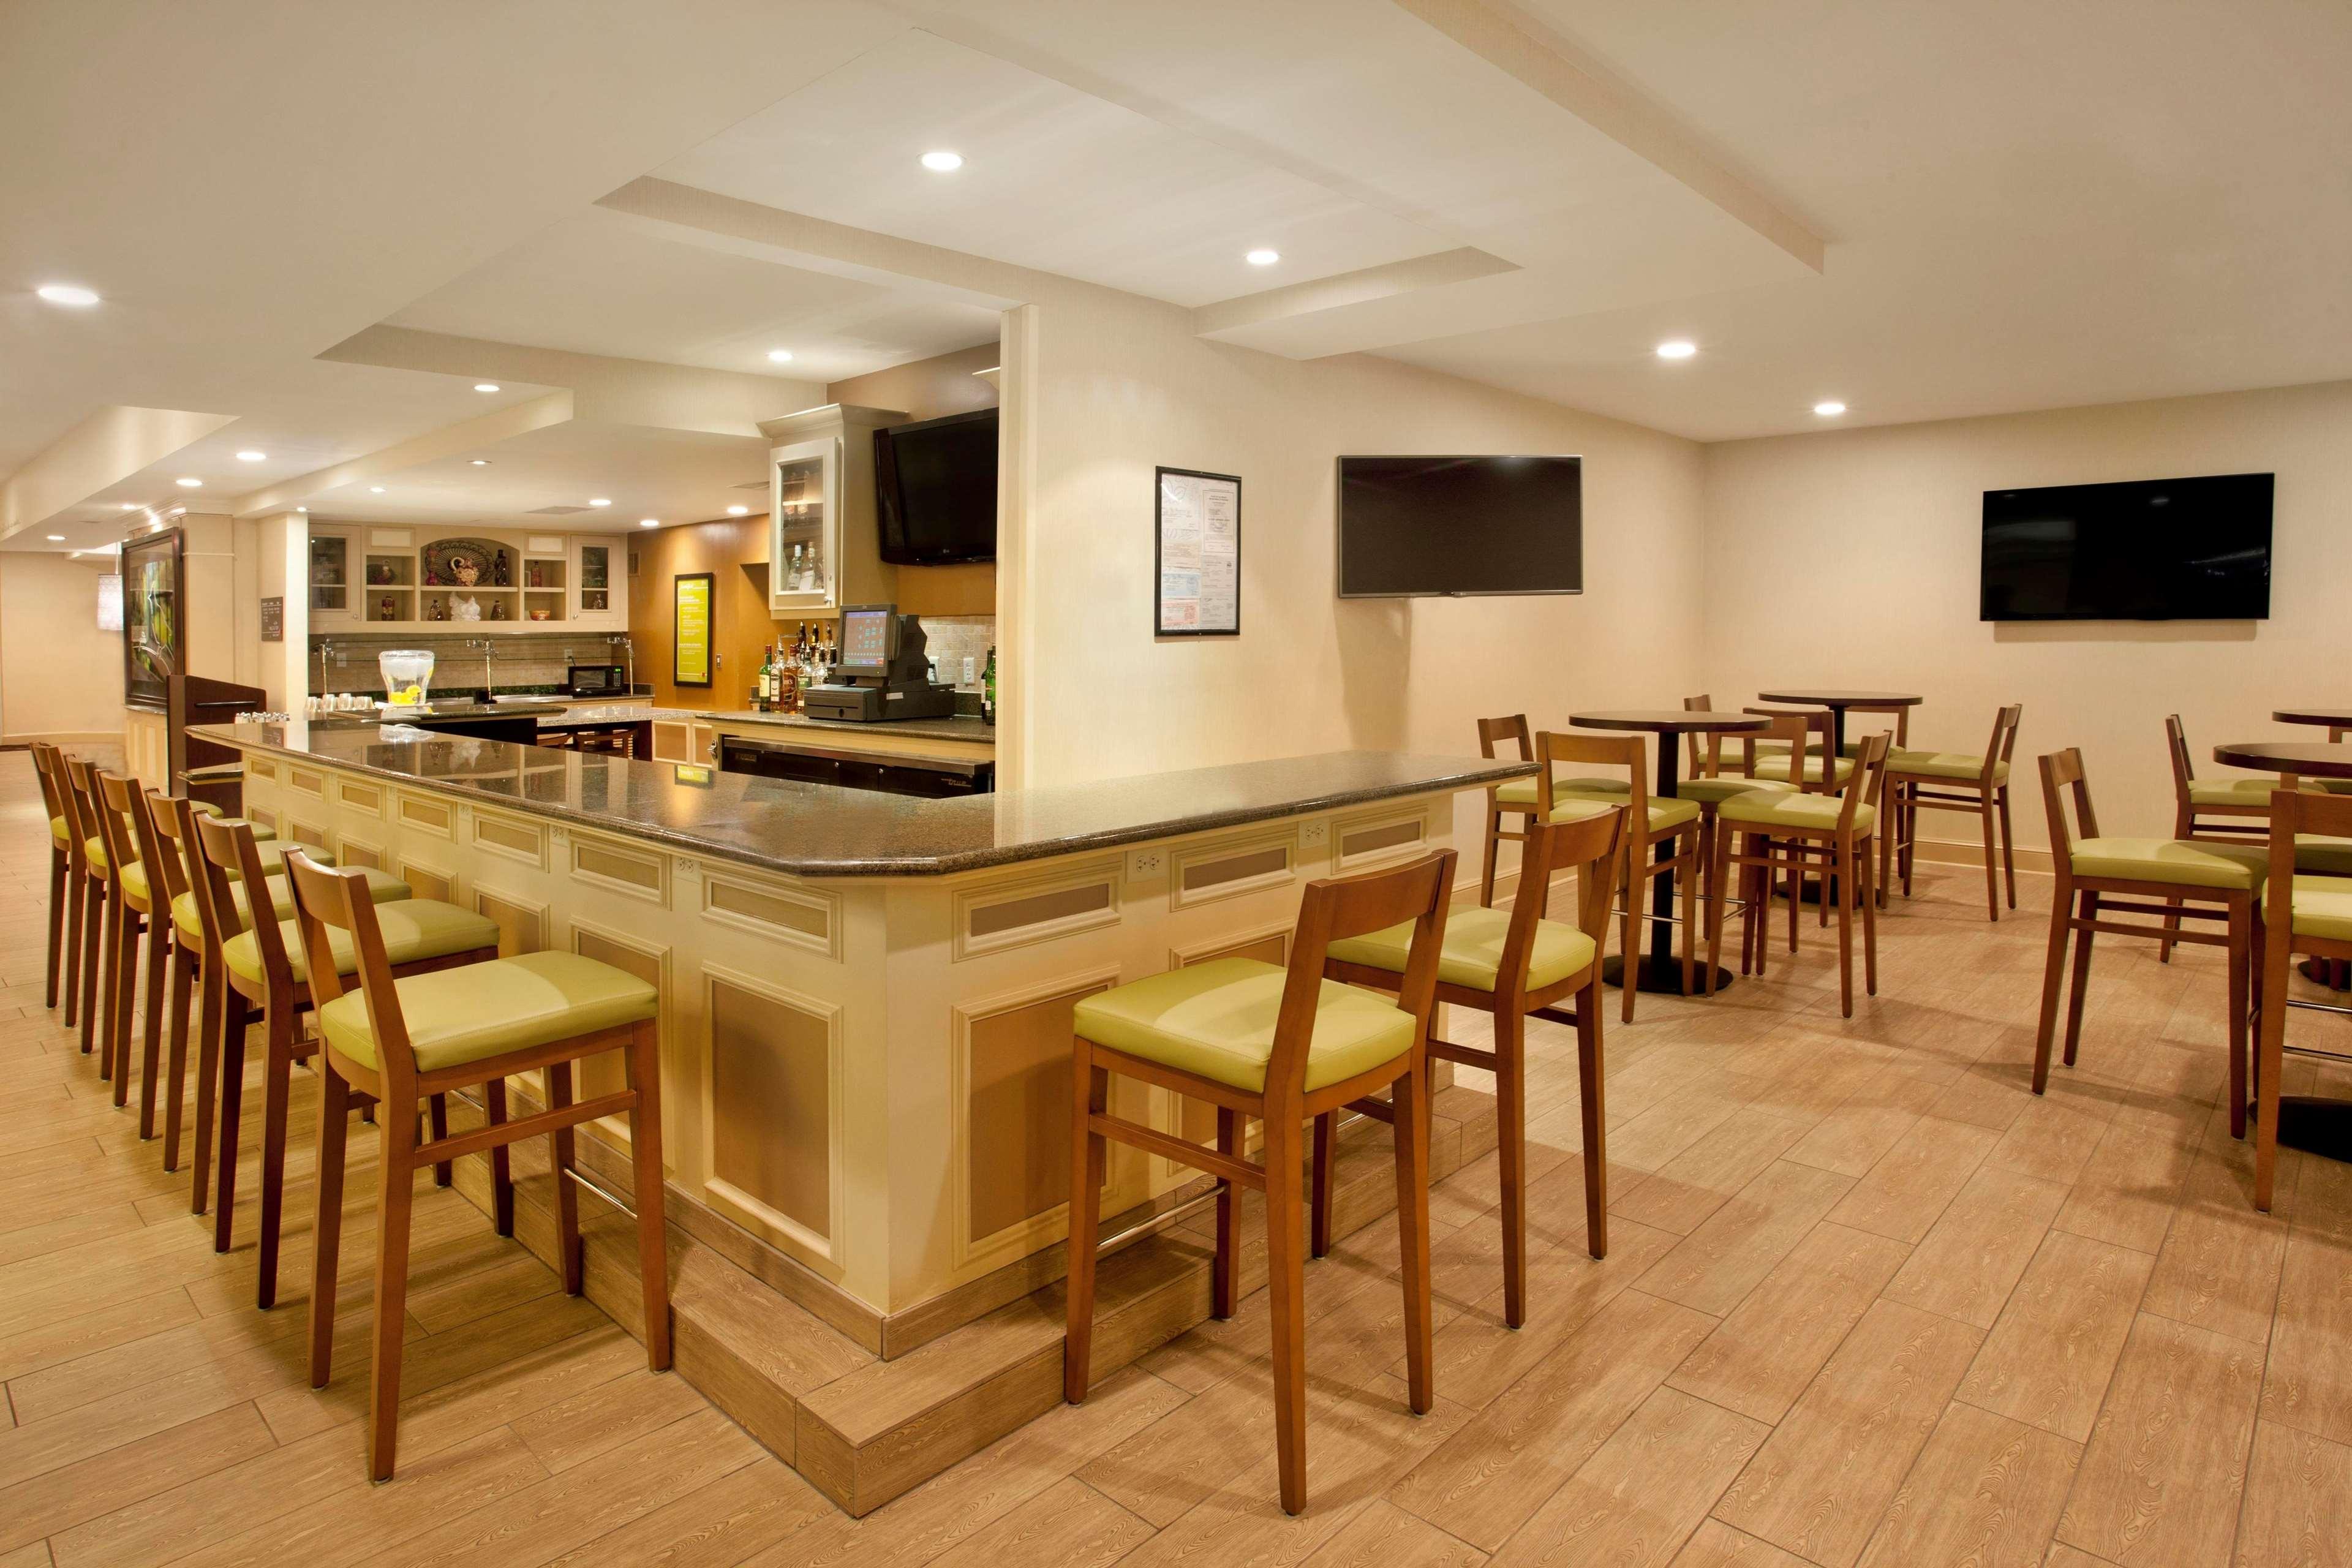 Hilton Garden Inn Fort Collins image 23